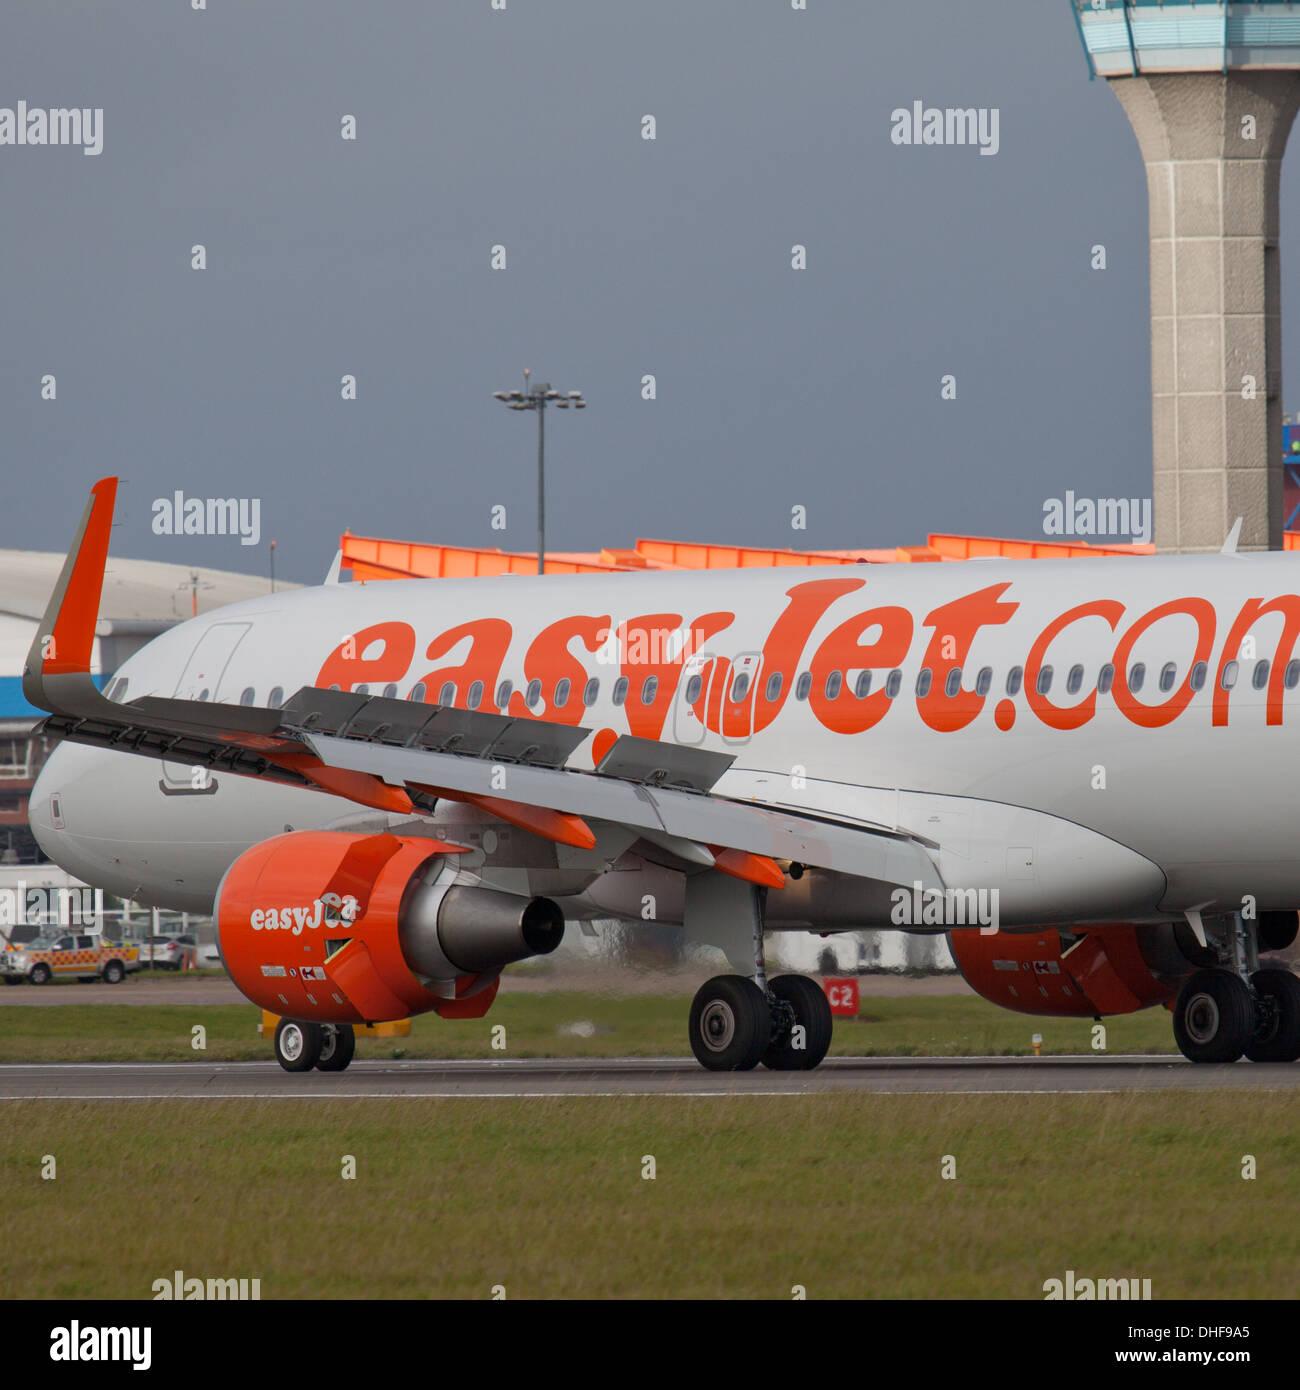 easyJet Airbus a320 G-EZWO landing at London-Luton Airport LTN - Stock Image